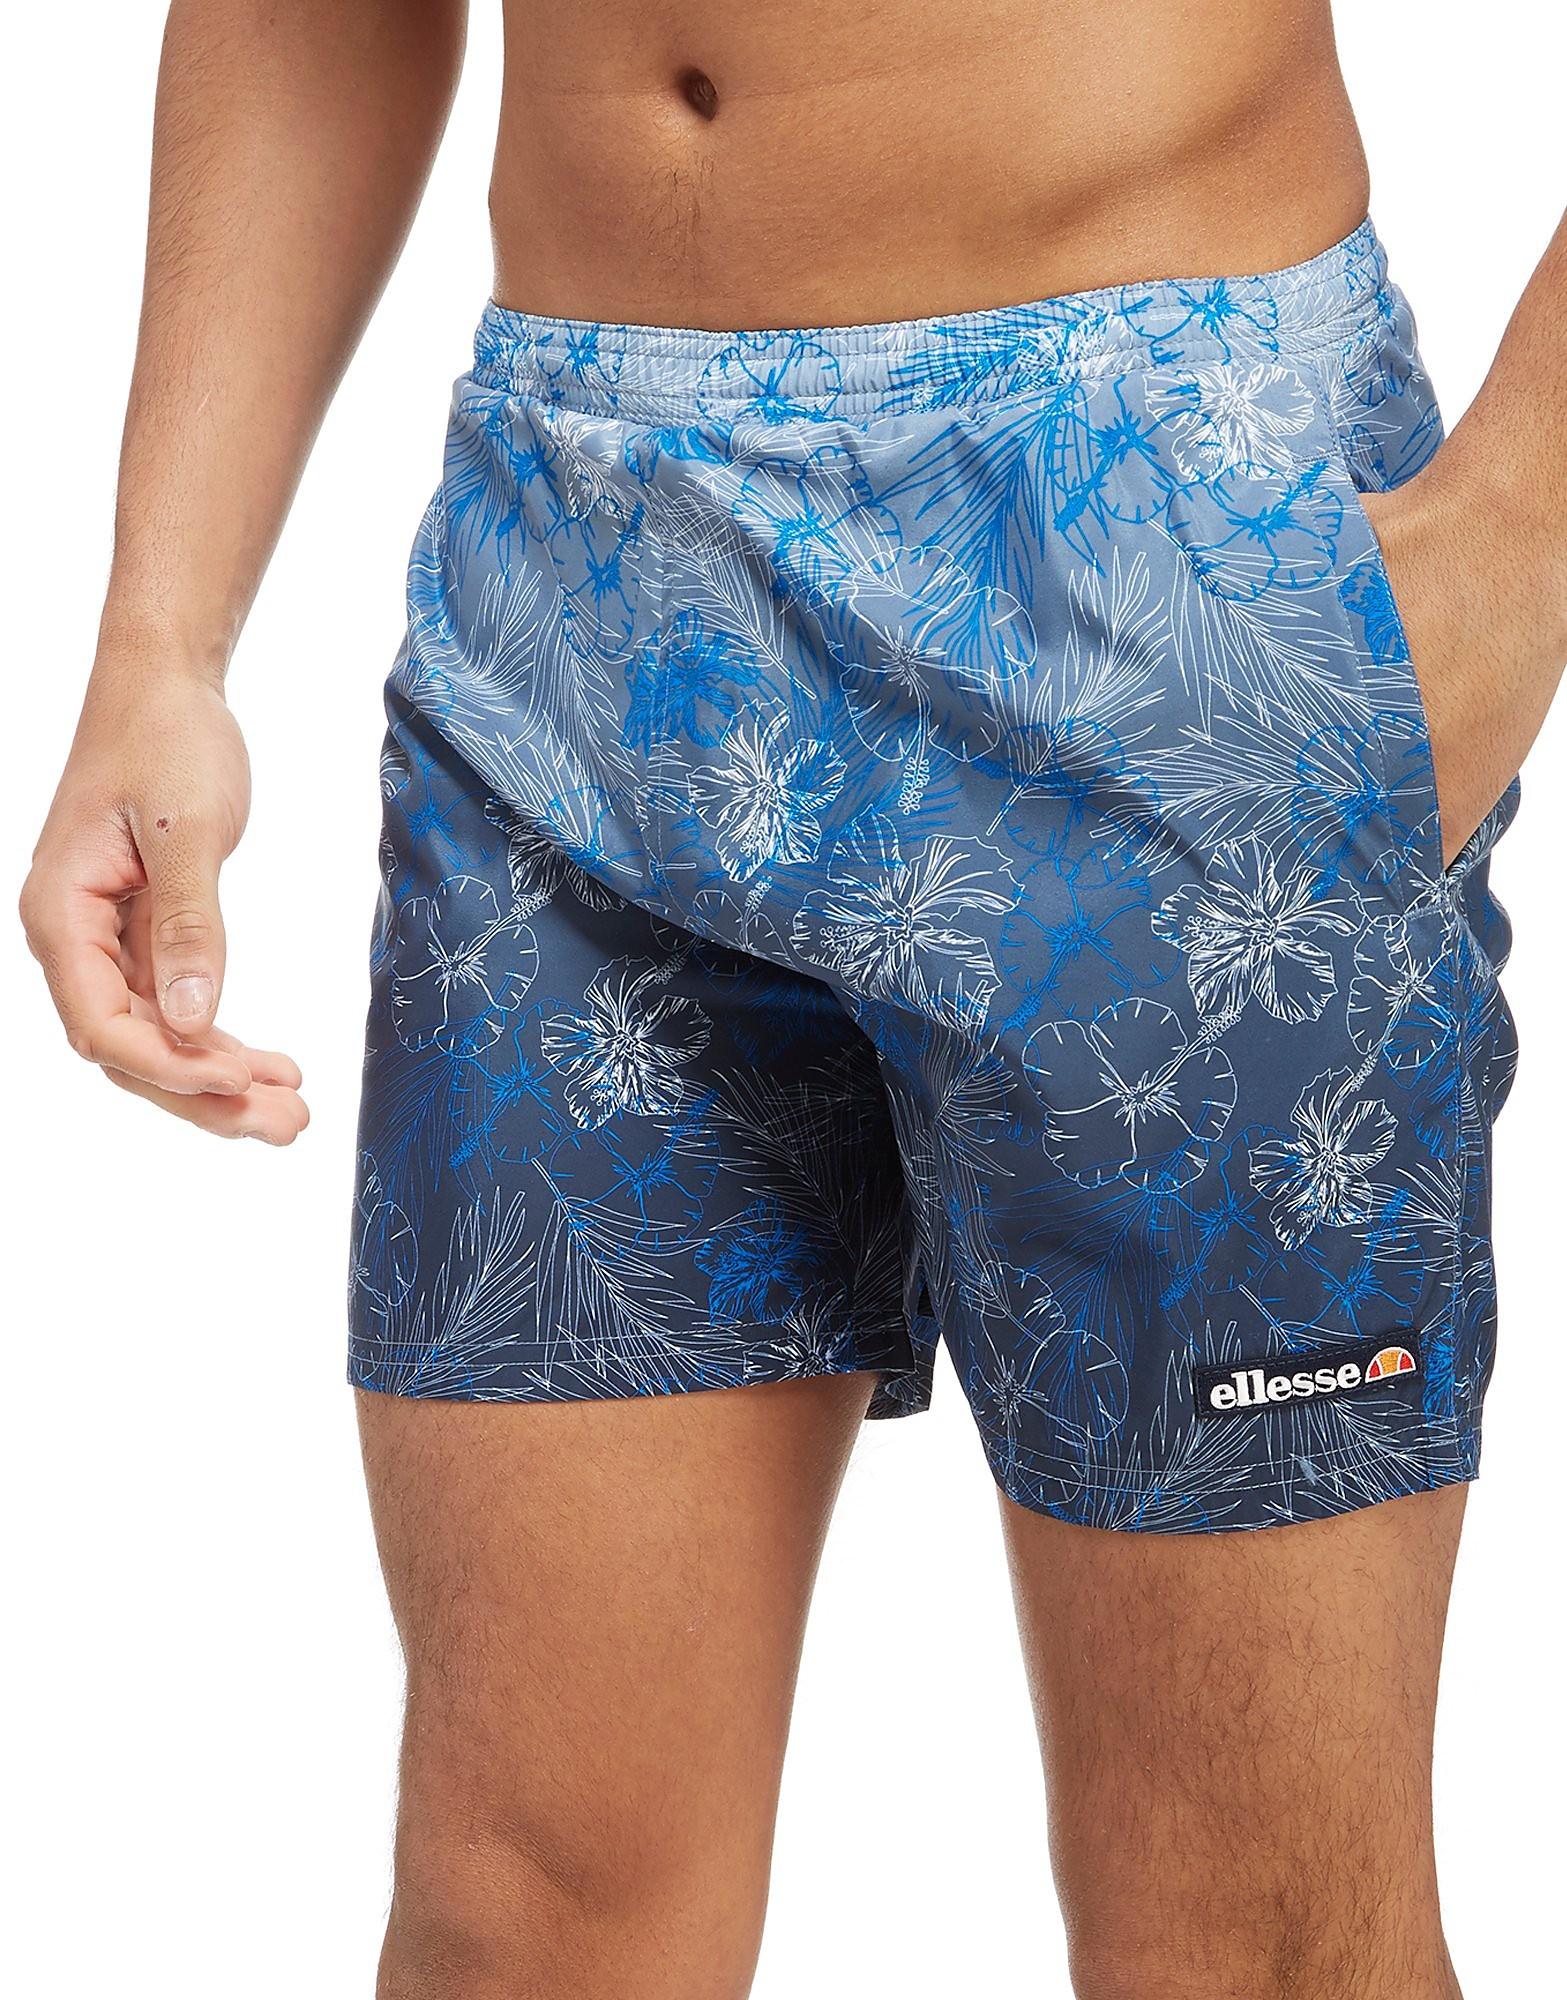 Ellesse Simeone Swim Shorts